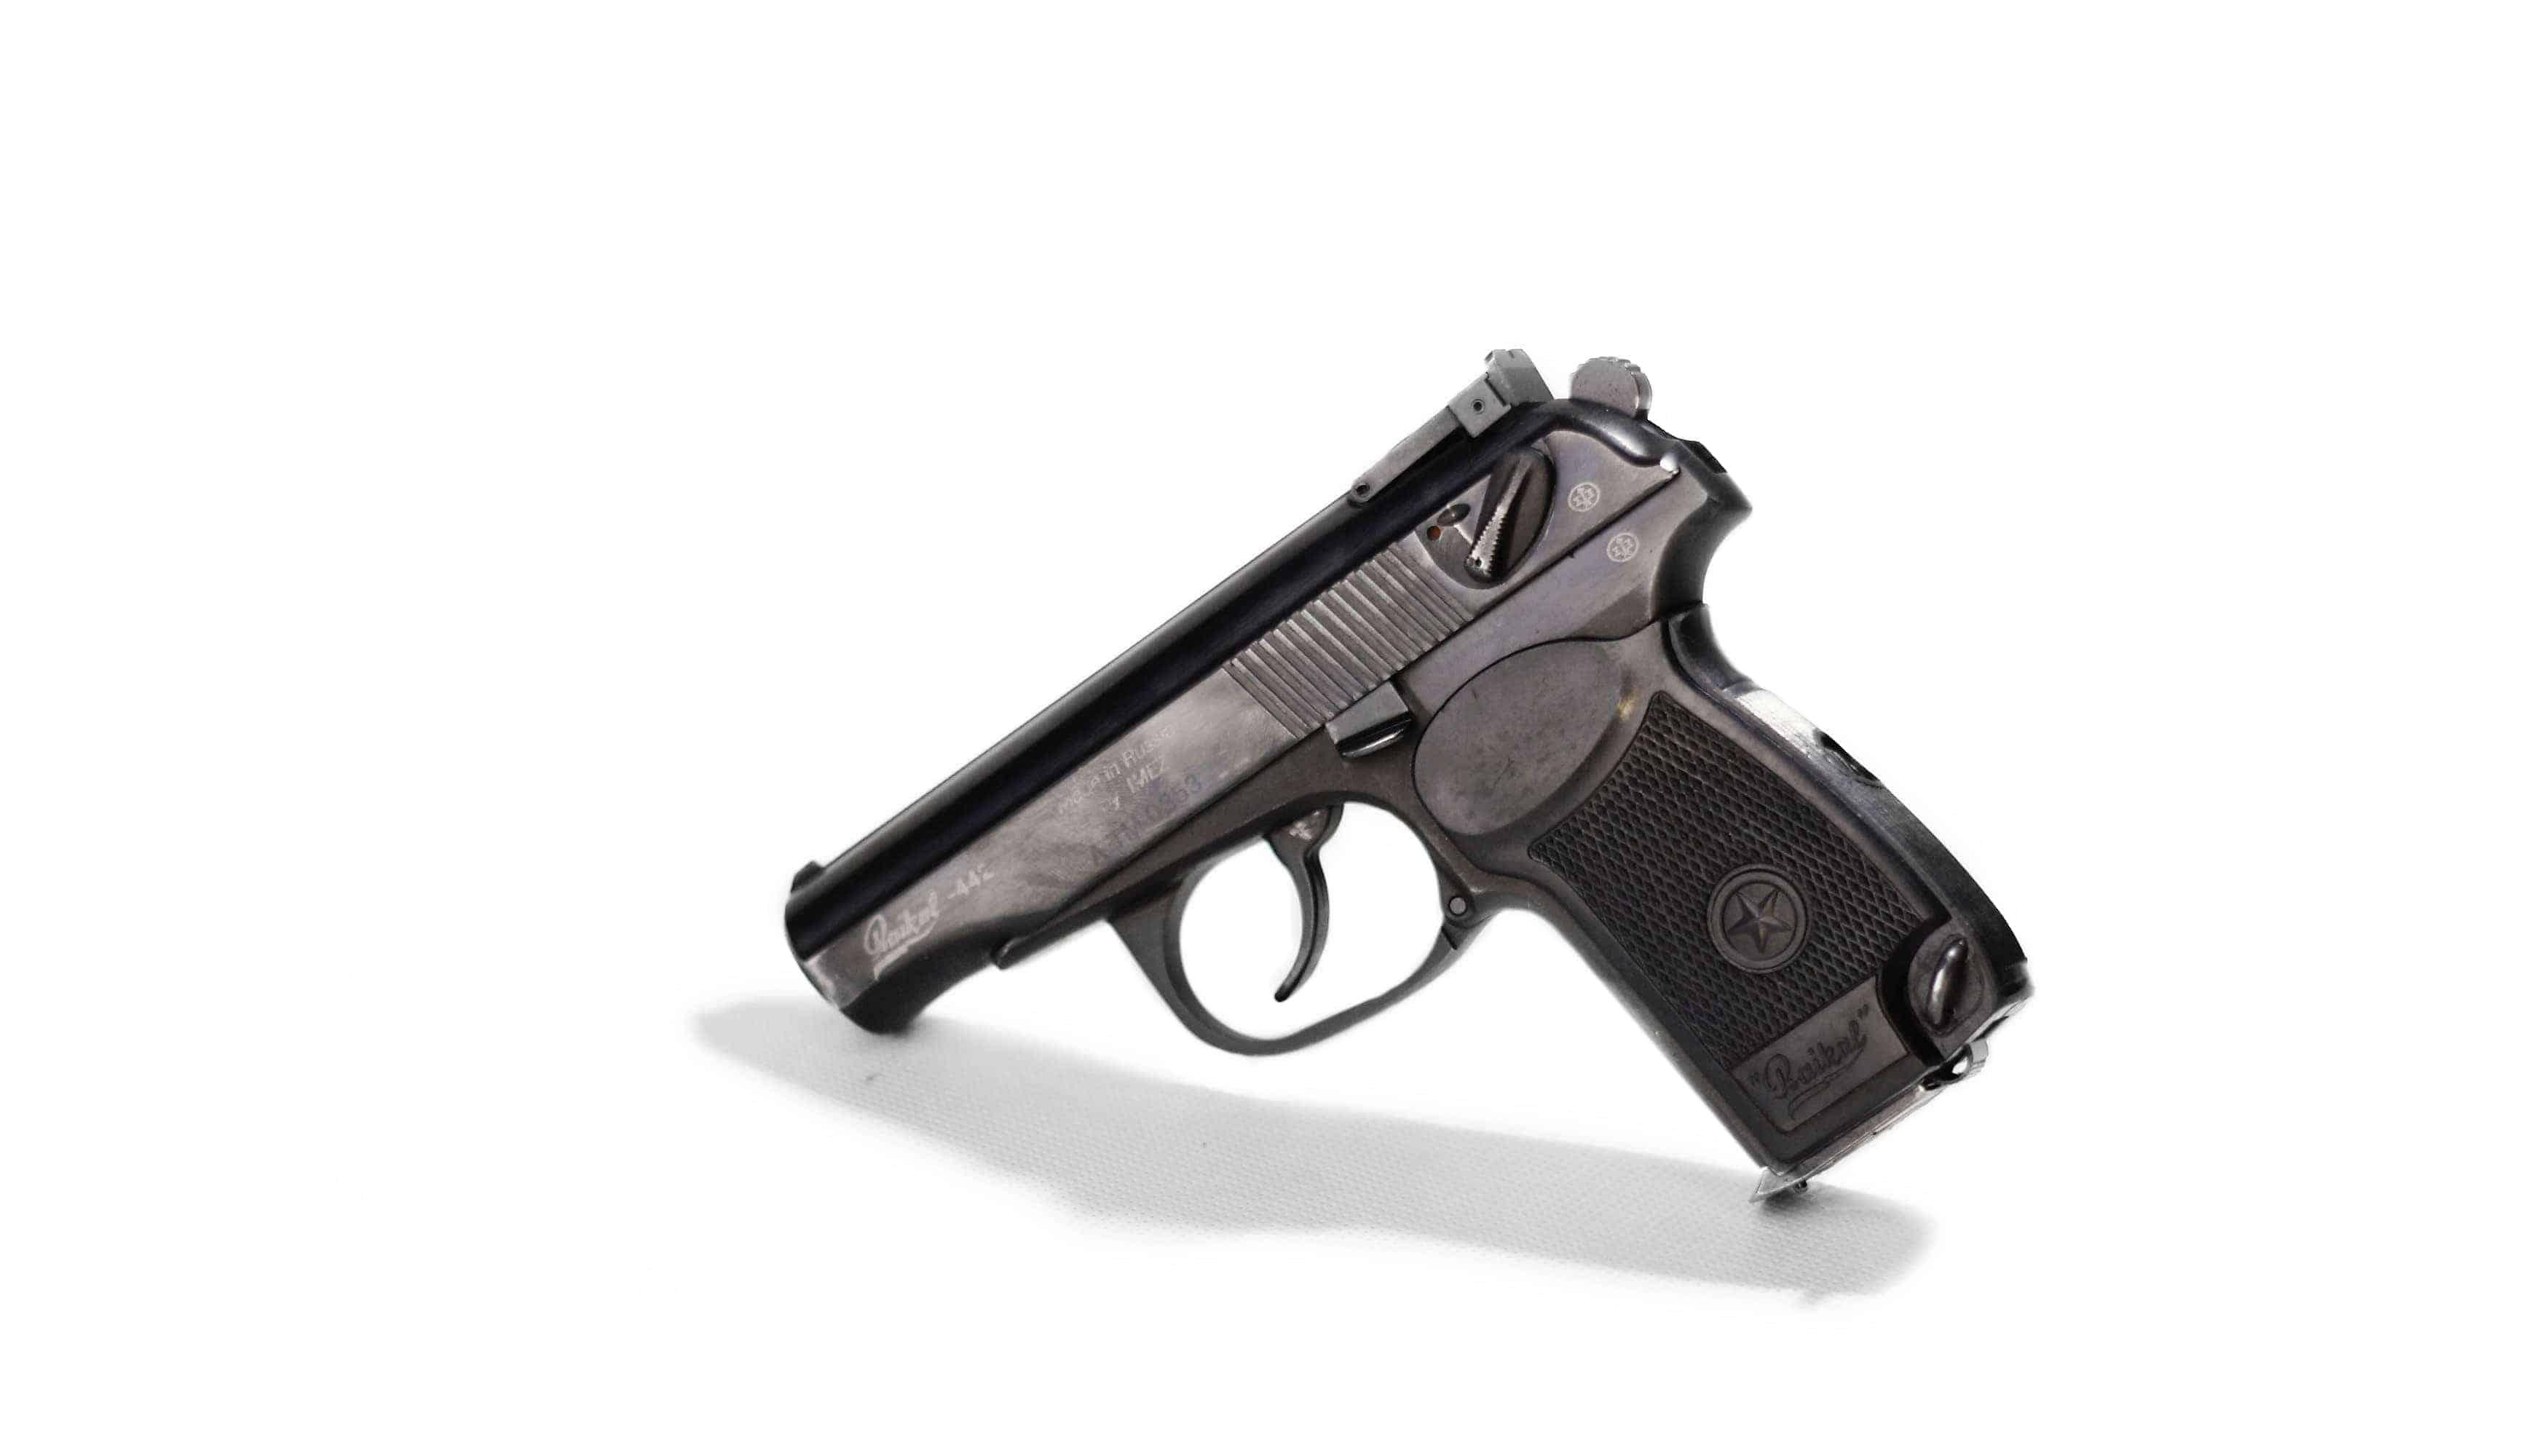 https://strzelnicabojowa.pl/uploads/guns/Baikal_442(9x18mm)-WEB-WIDE.JPG